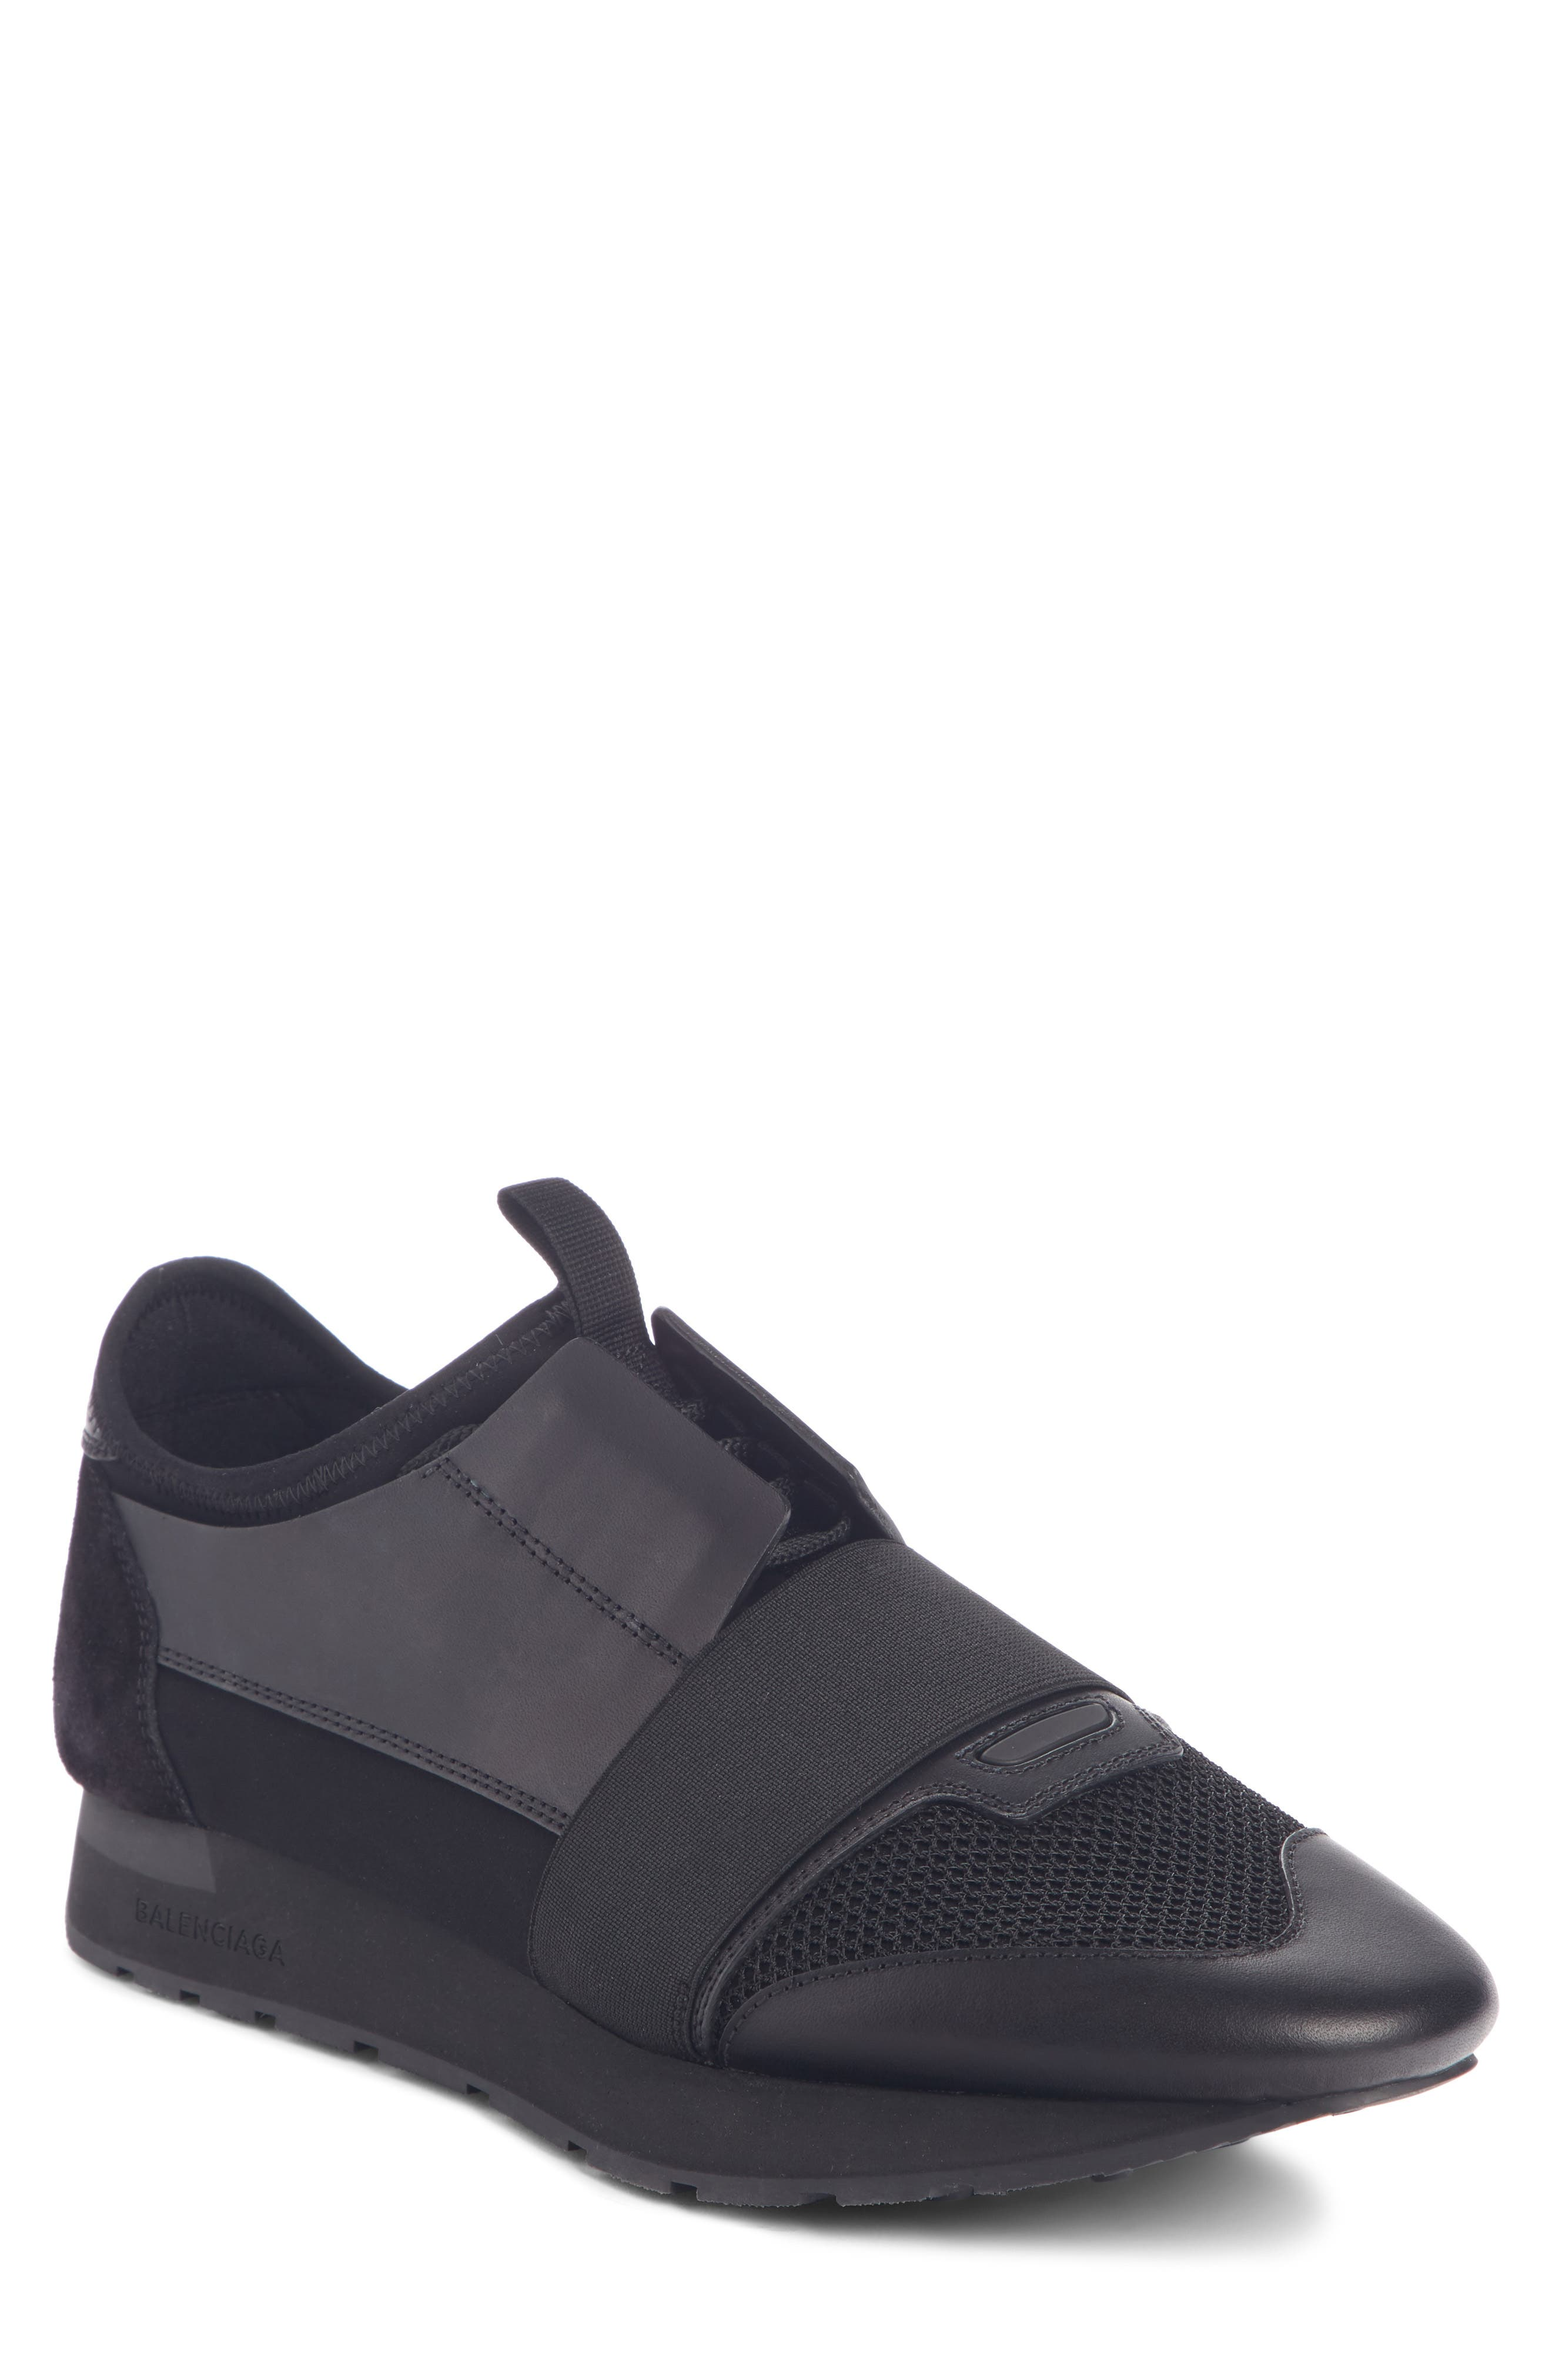 BALENCIAGA,                             Race Runner Sneaker,                             Main thumbnail 1, color,                             BLACK/ BLACK/ BLACK